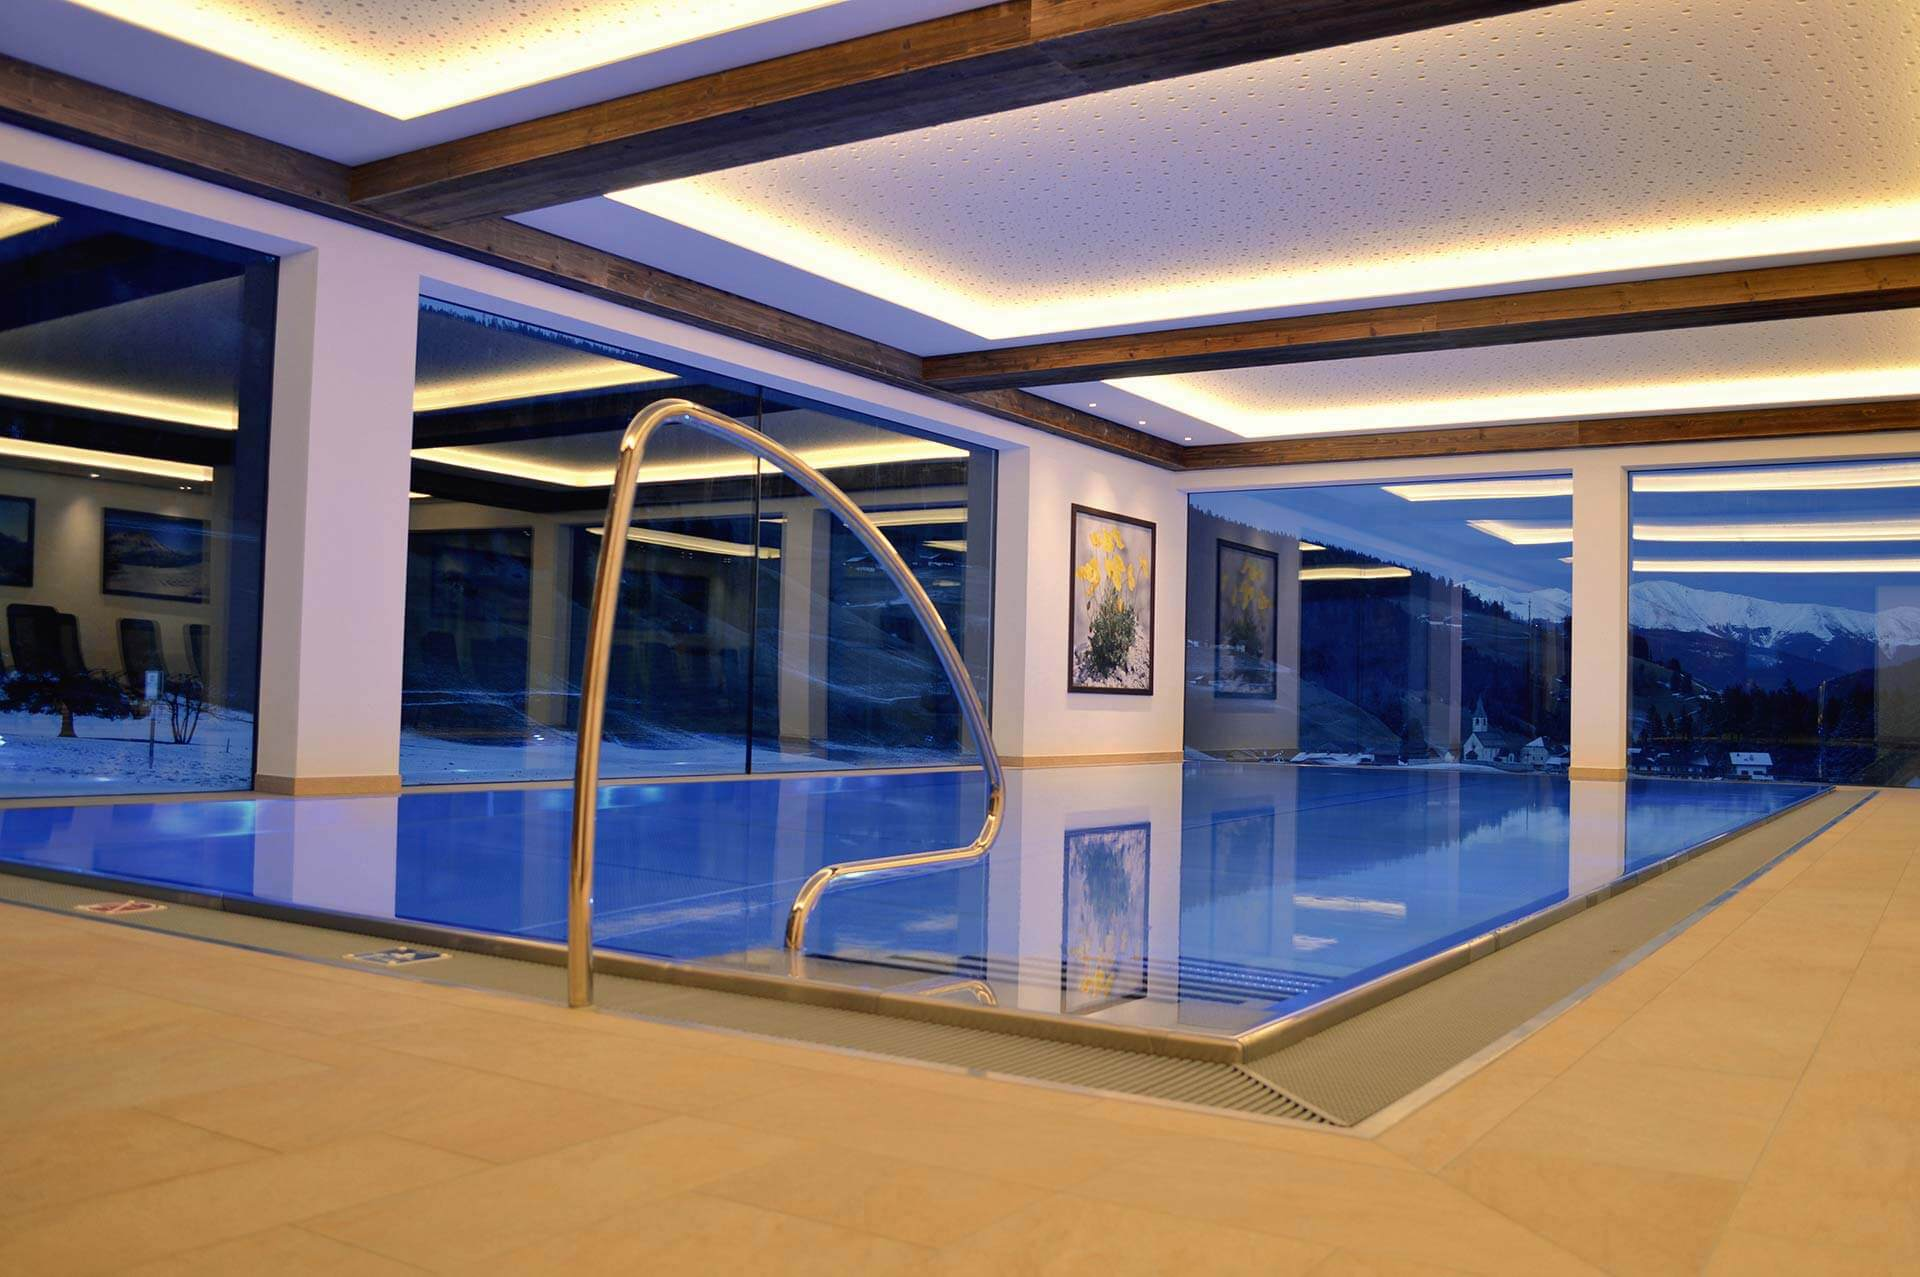 Hotel in alta pusteria con piscina hotel trenker - Hotel dobbiaco con piscina ...